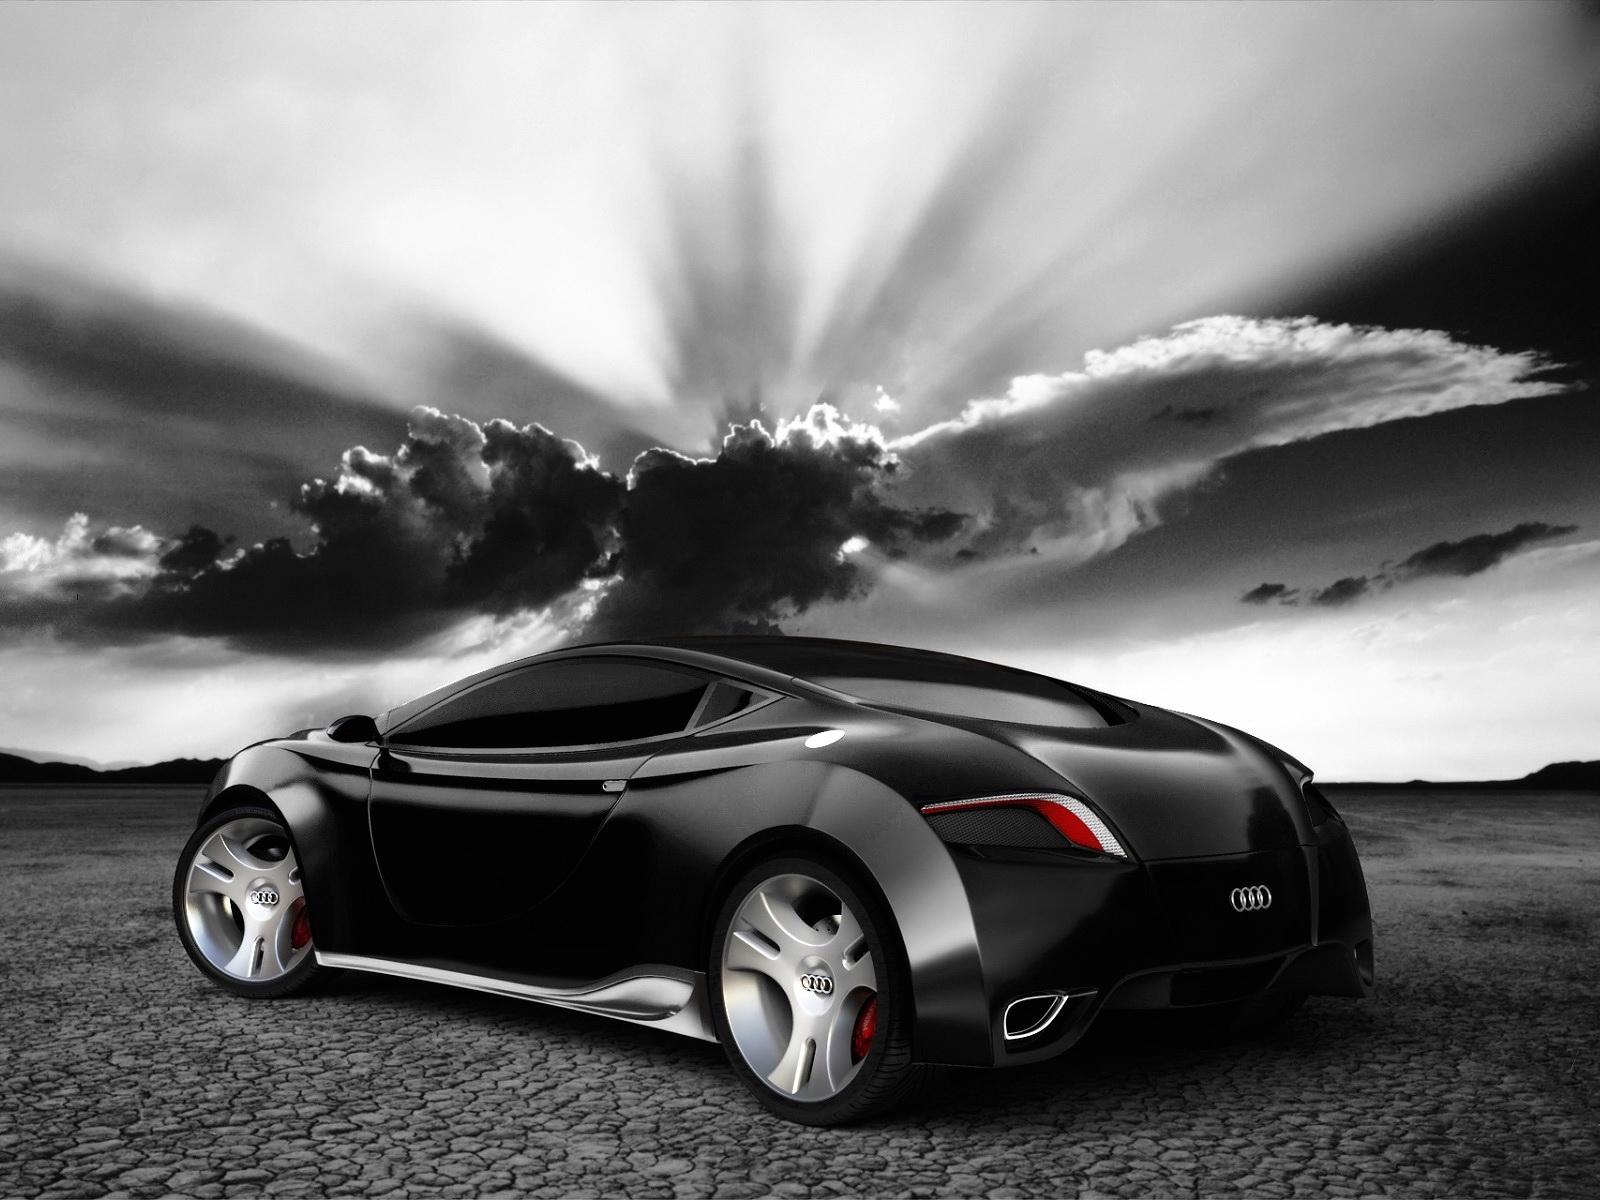 amazing cars hd 1